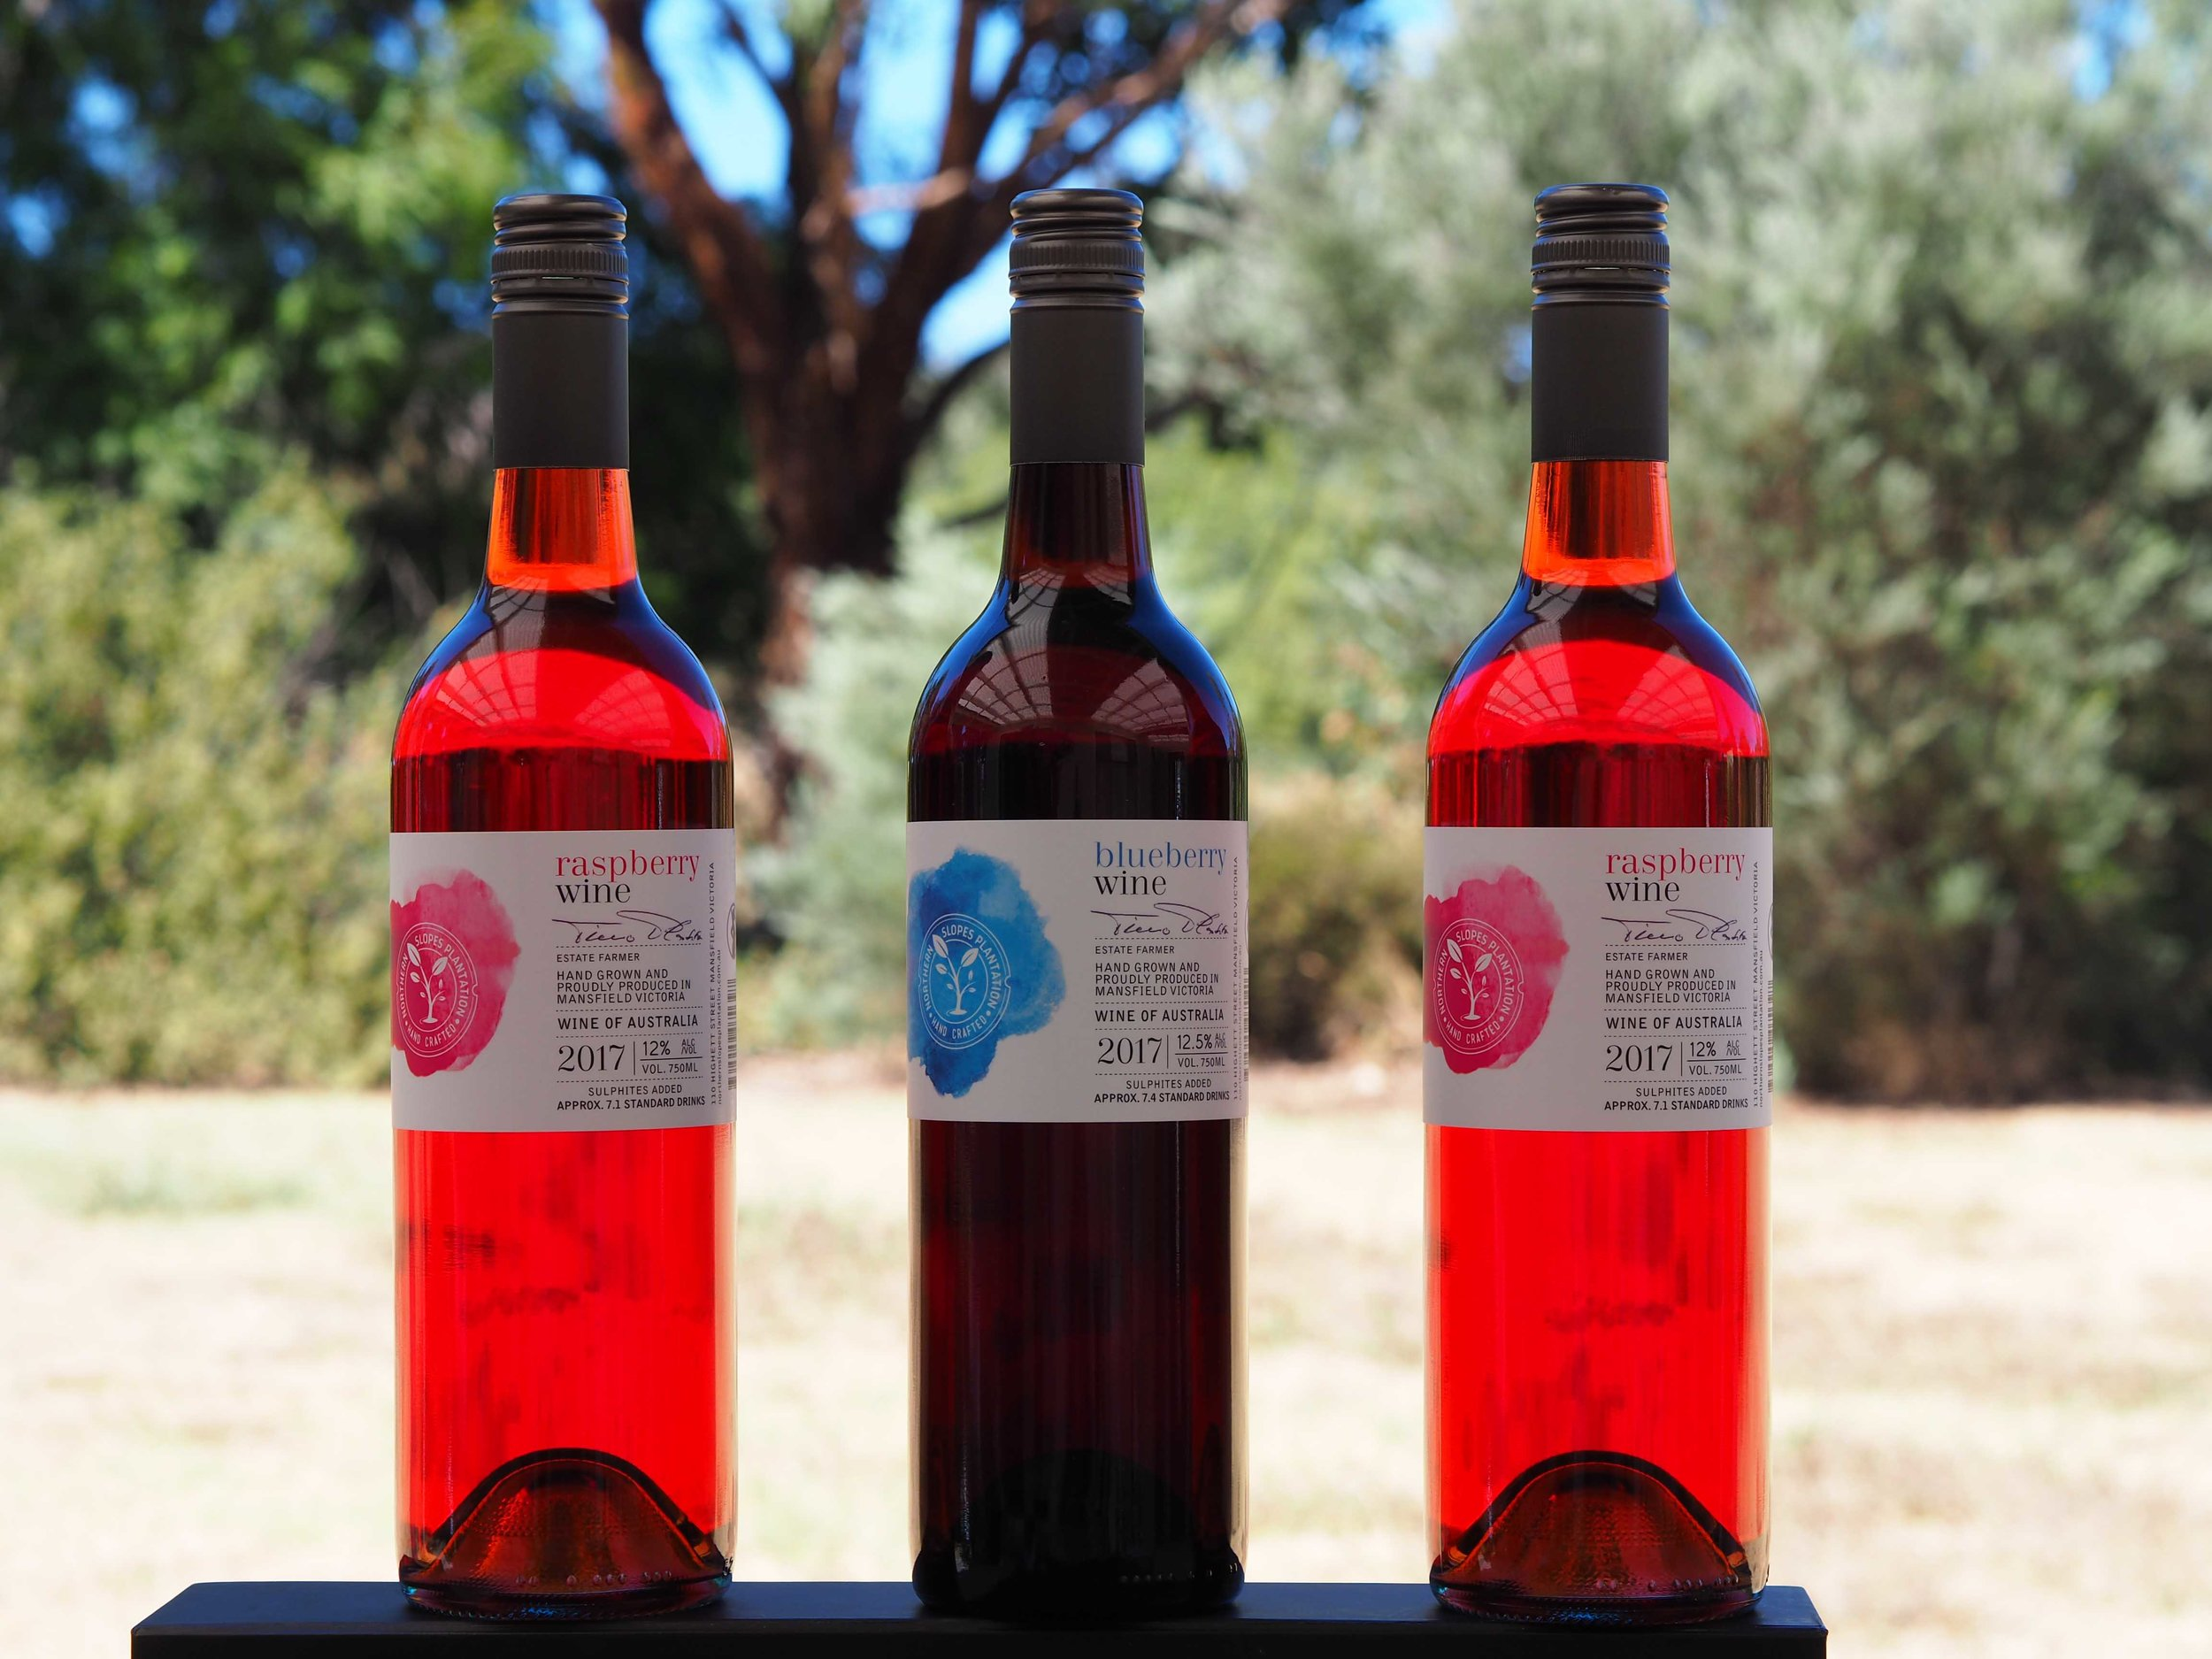 Our raspberry wine